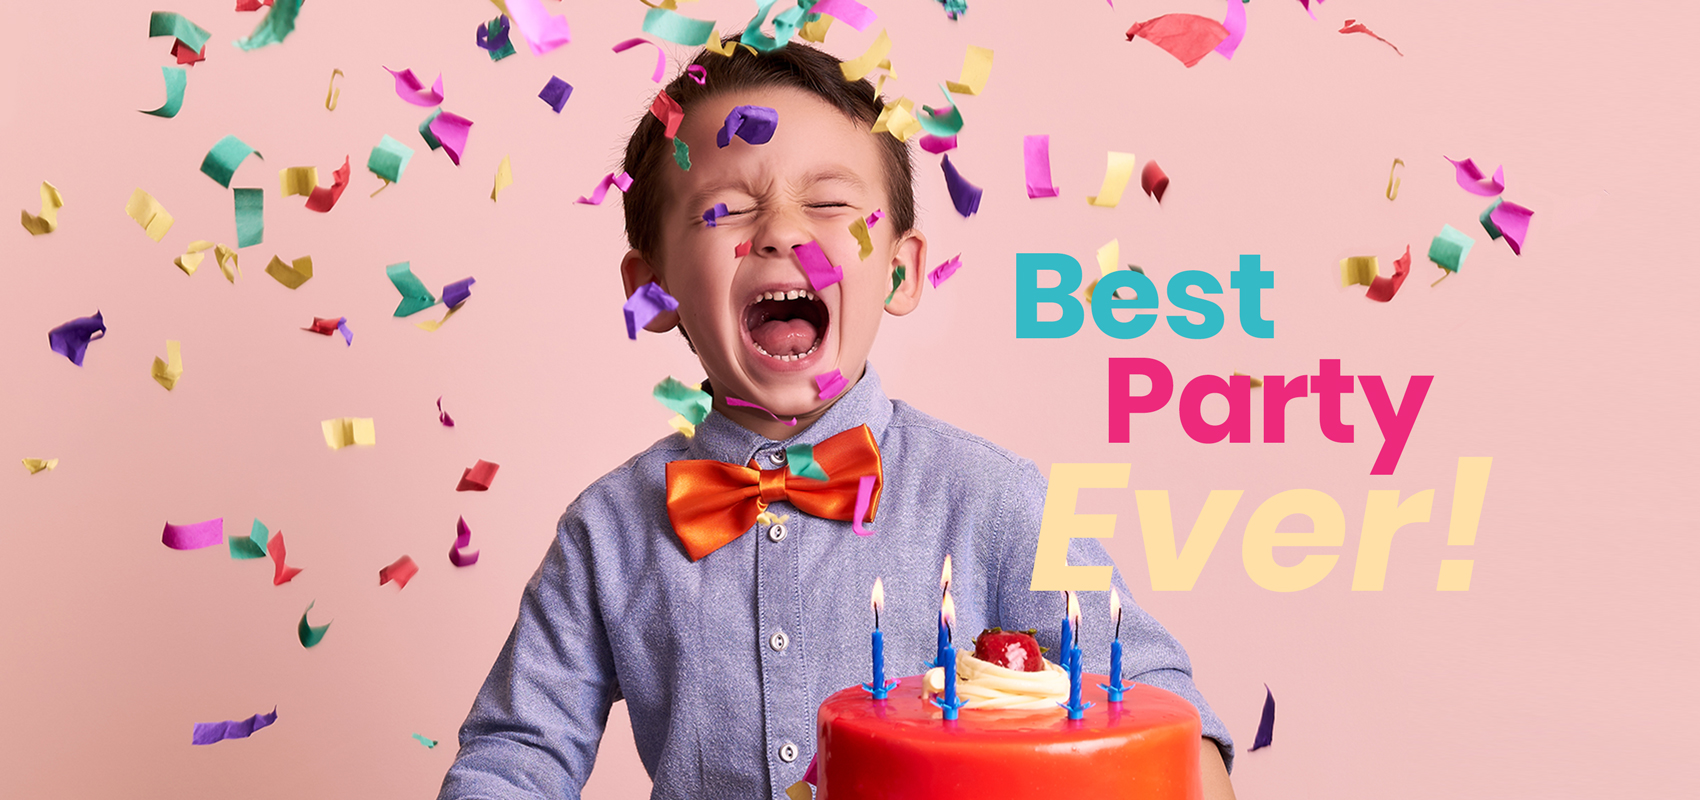 Happy child celebrating with birthday cake.